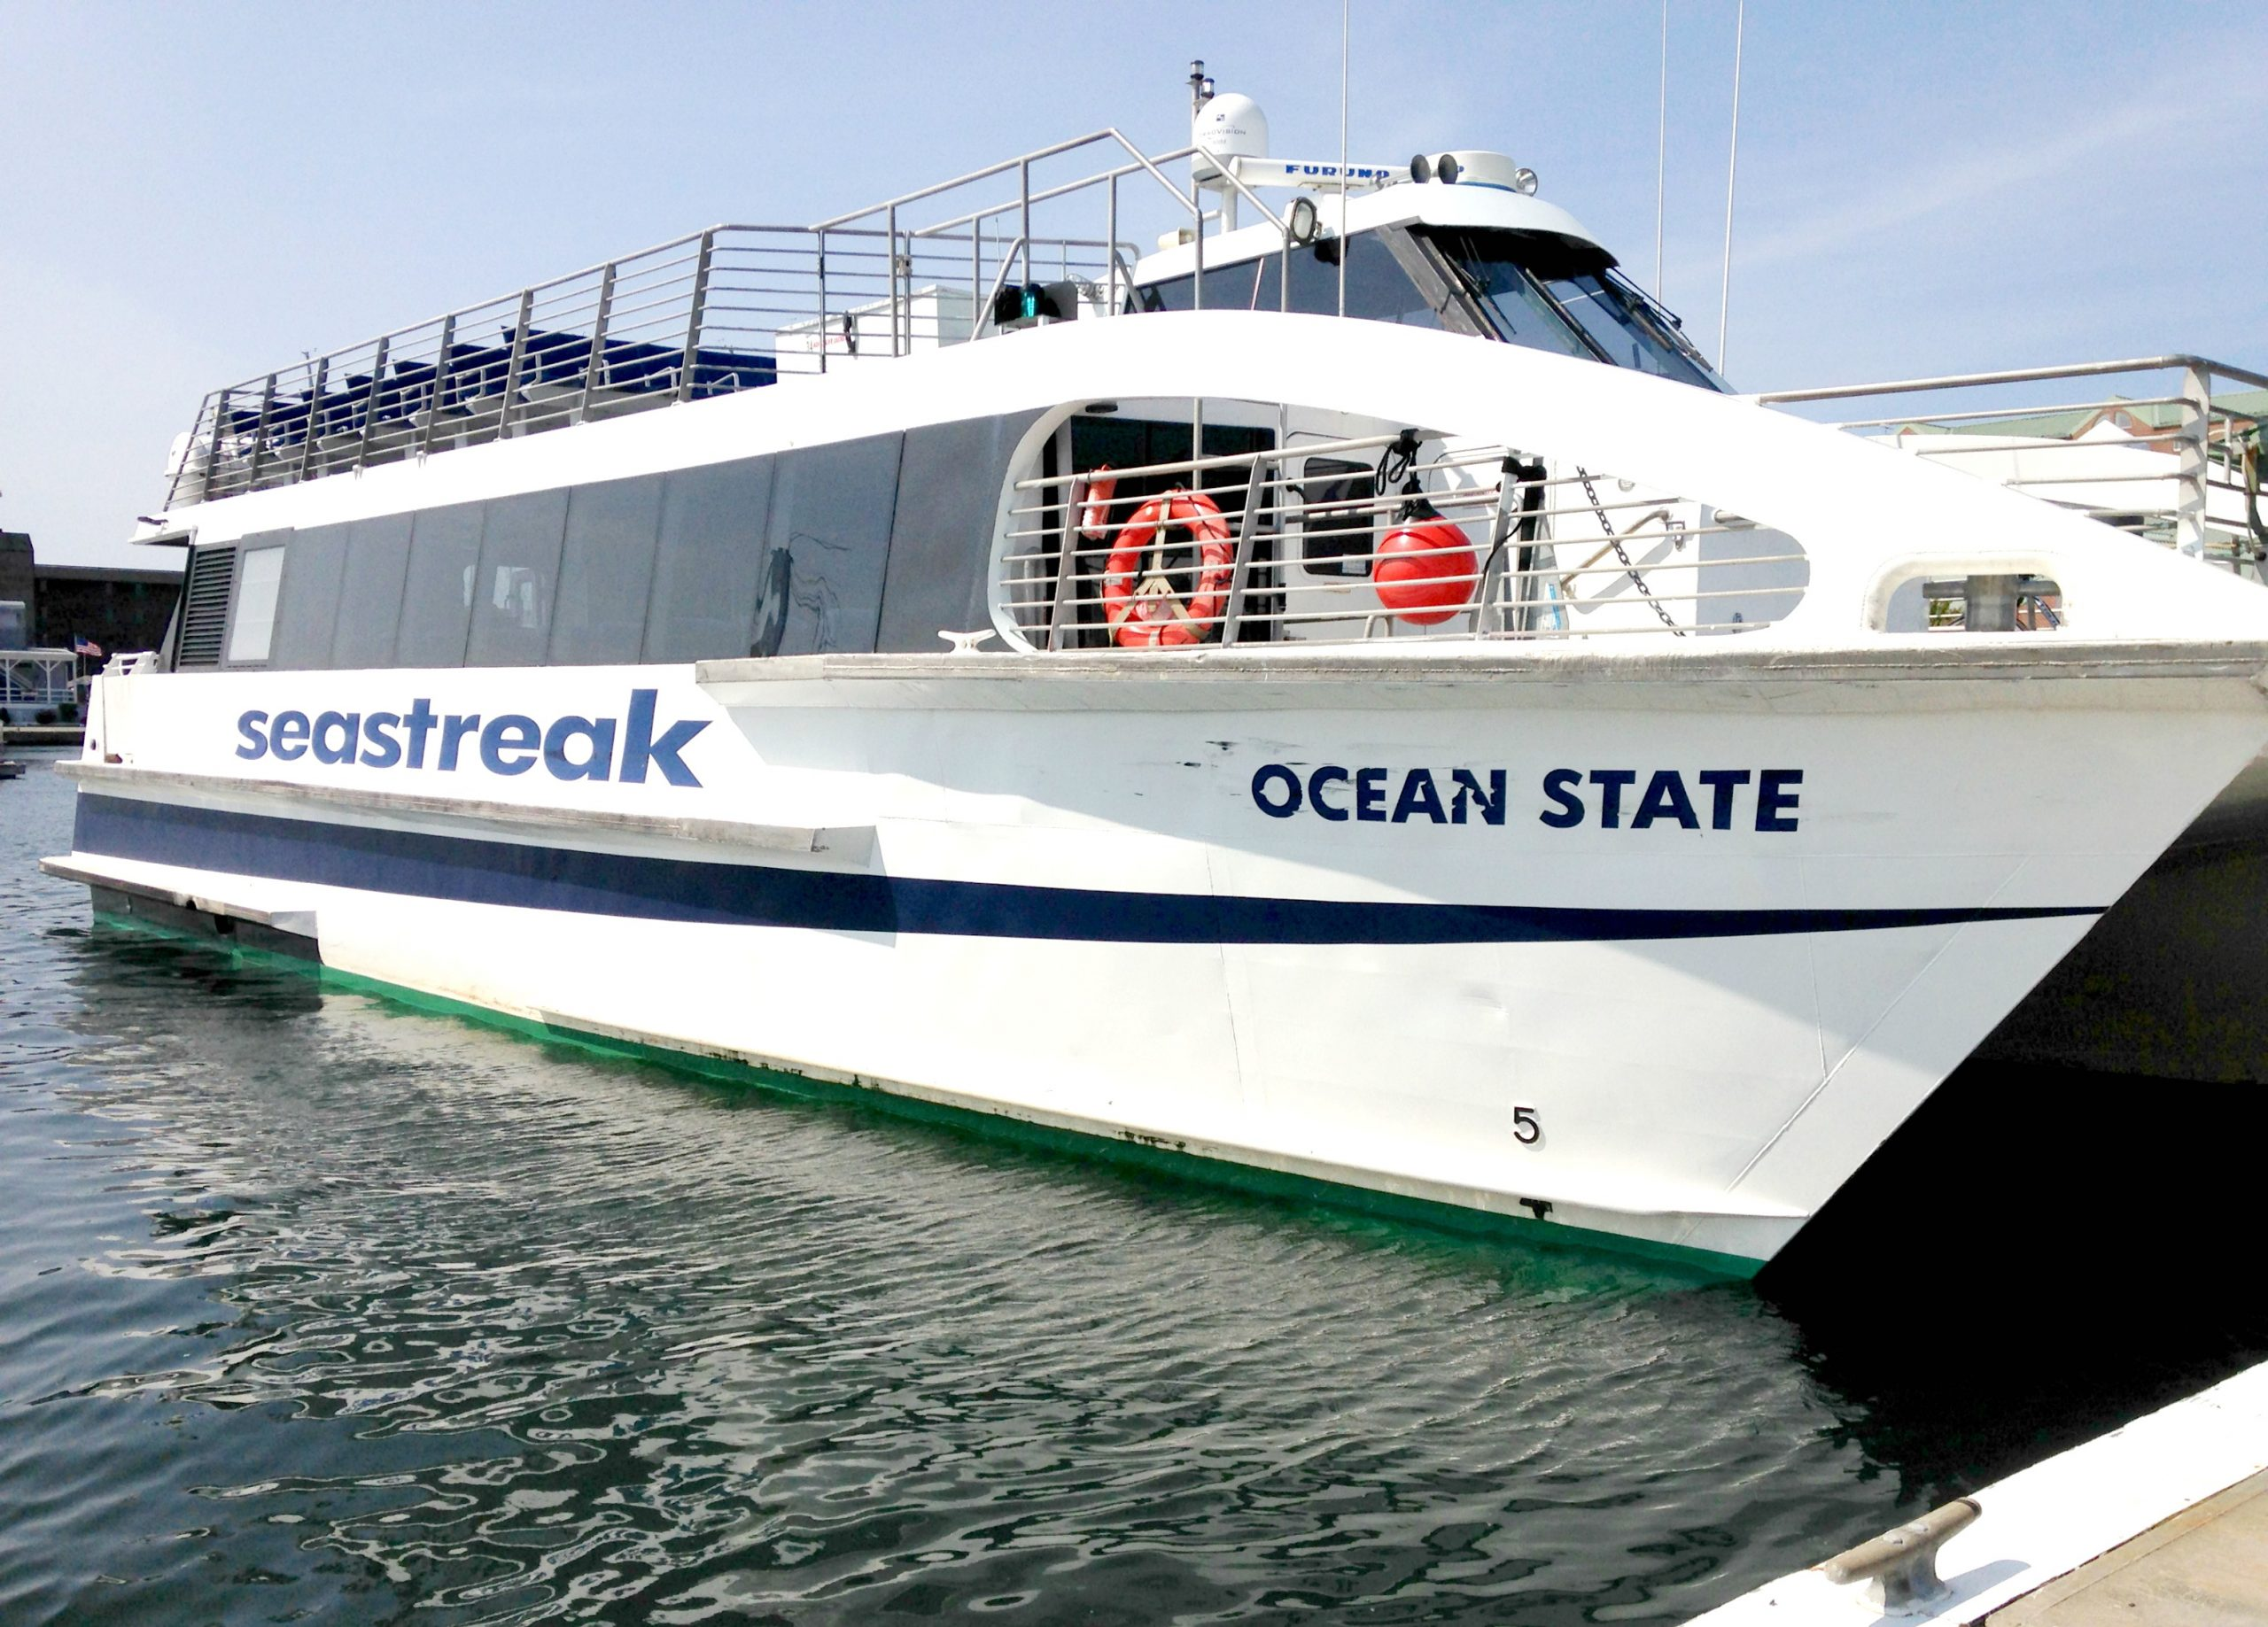 RI leaders tout Providence-Newport ferry   WJAR